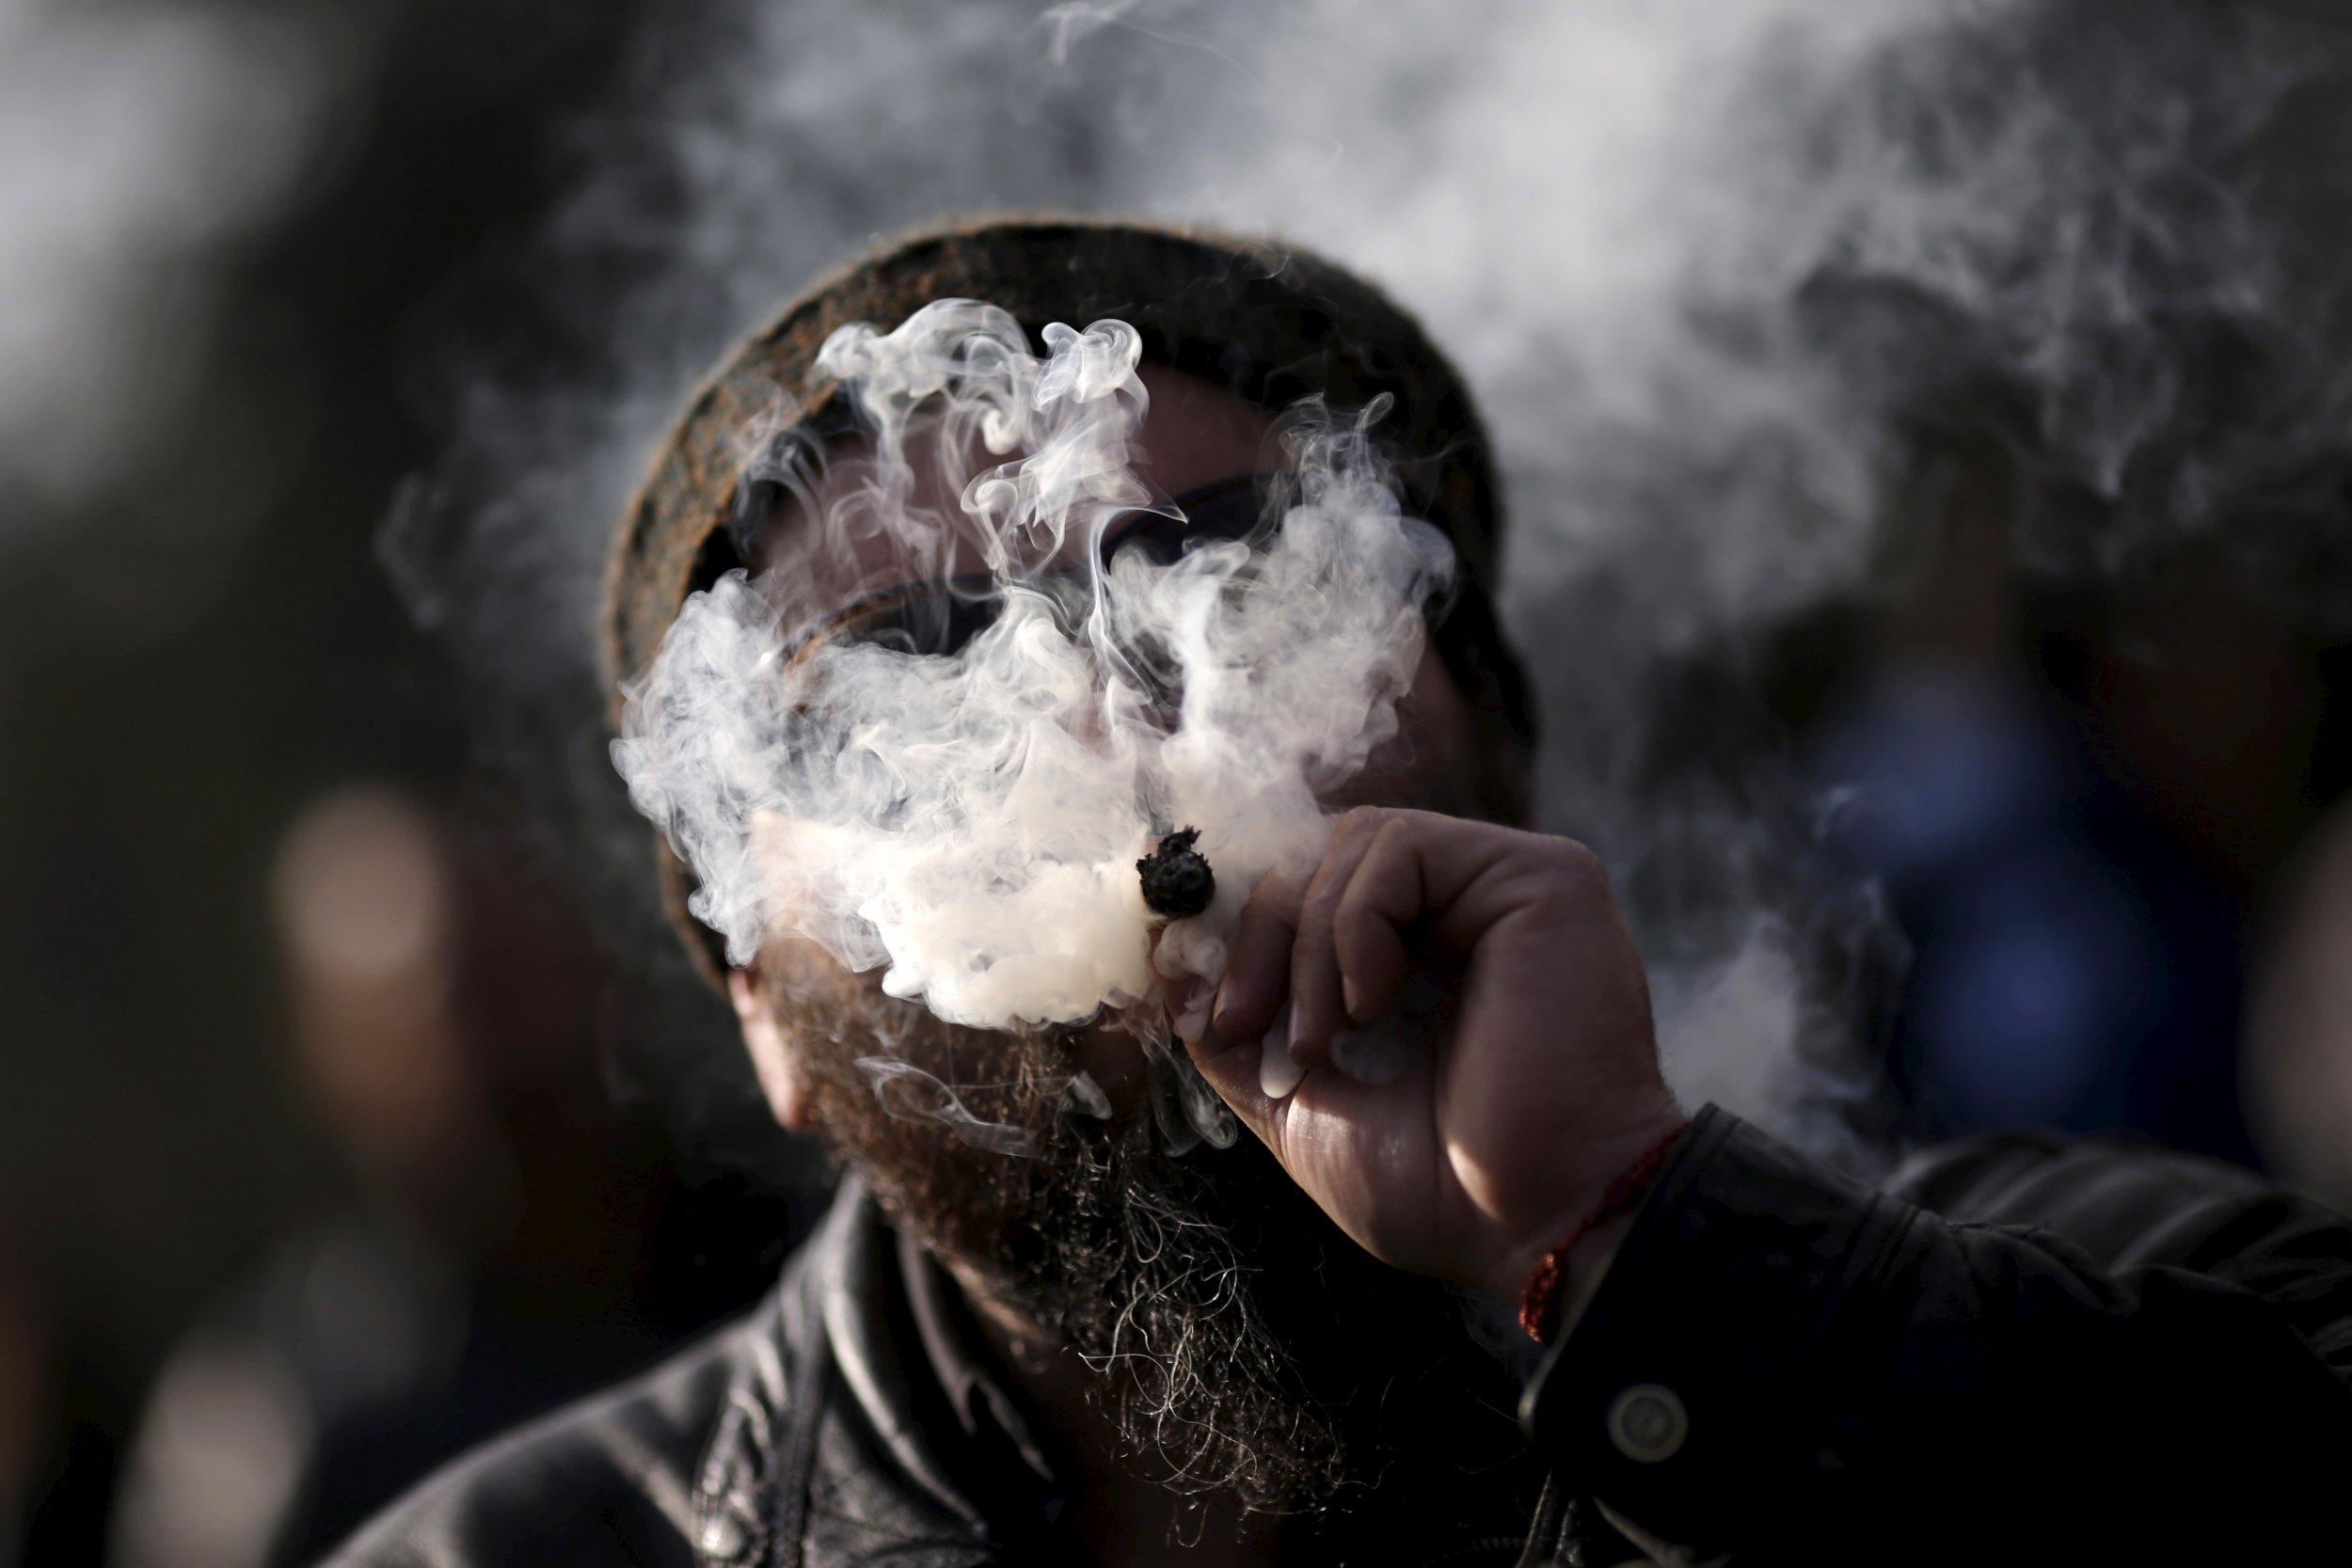 oregon court marijuana smoke is no rotten eggs